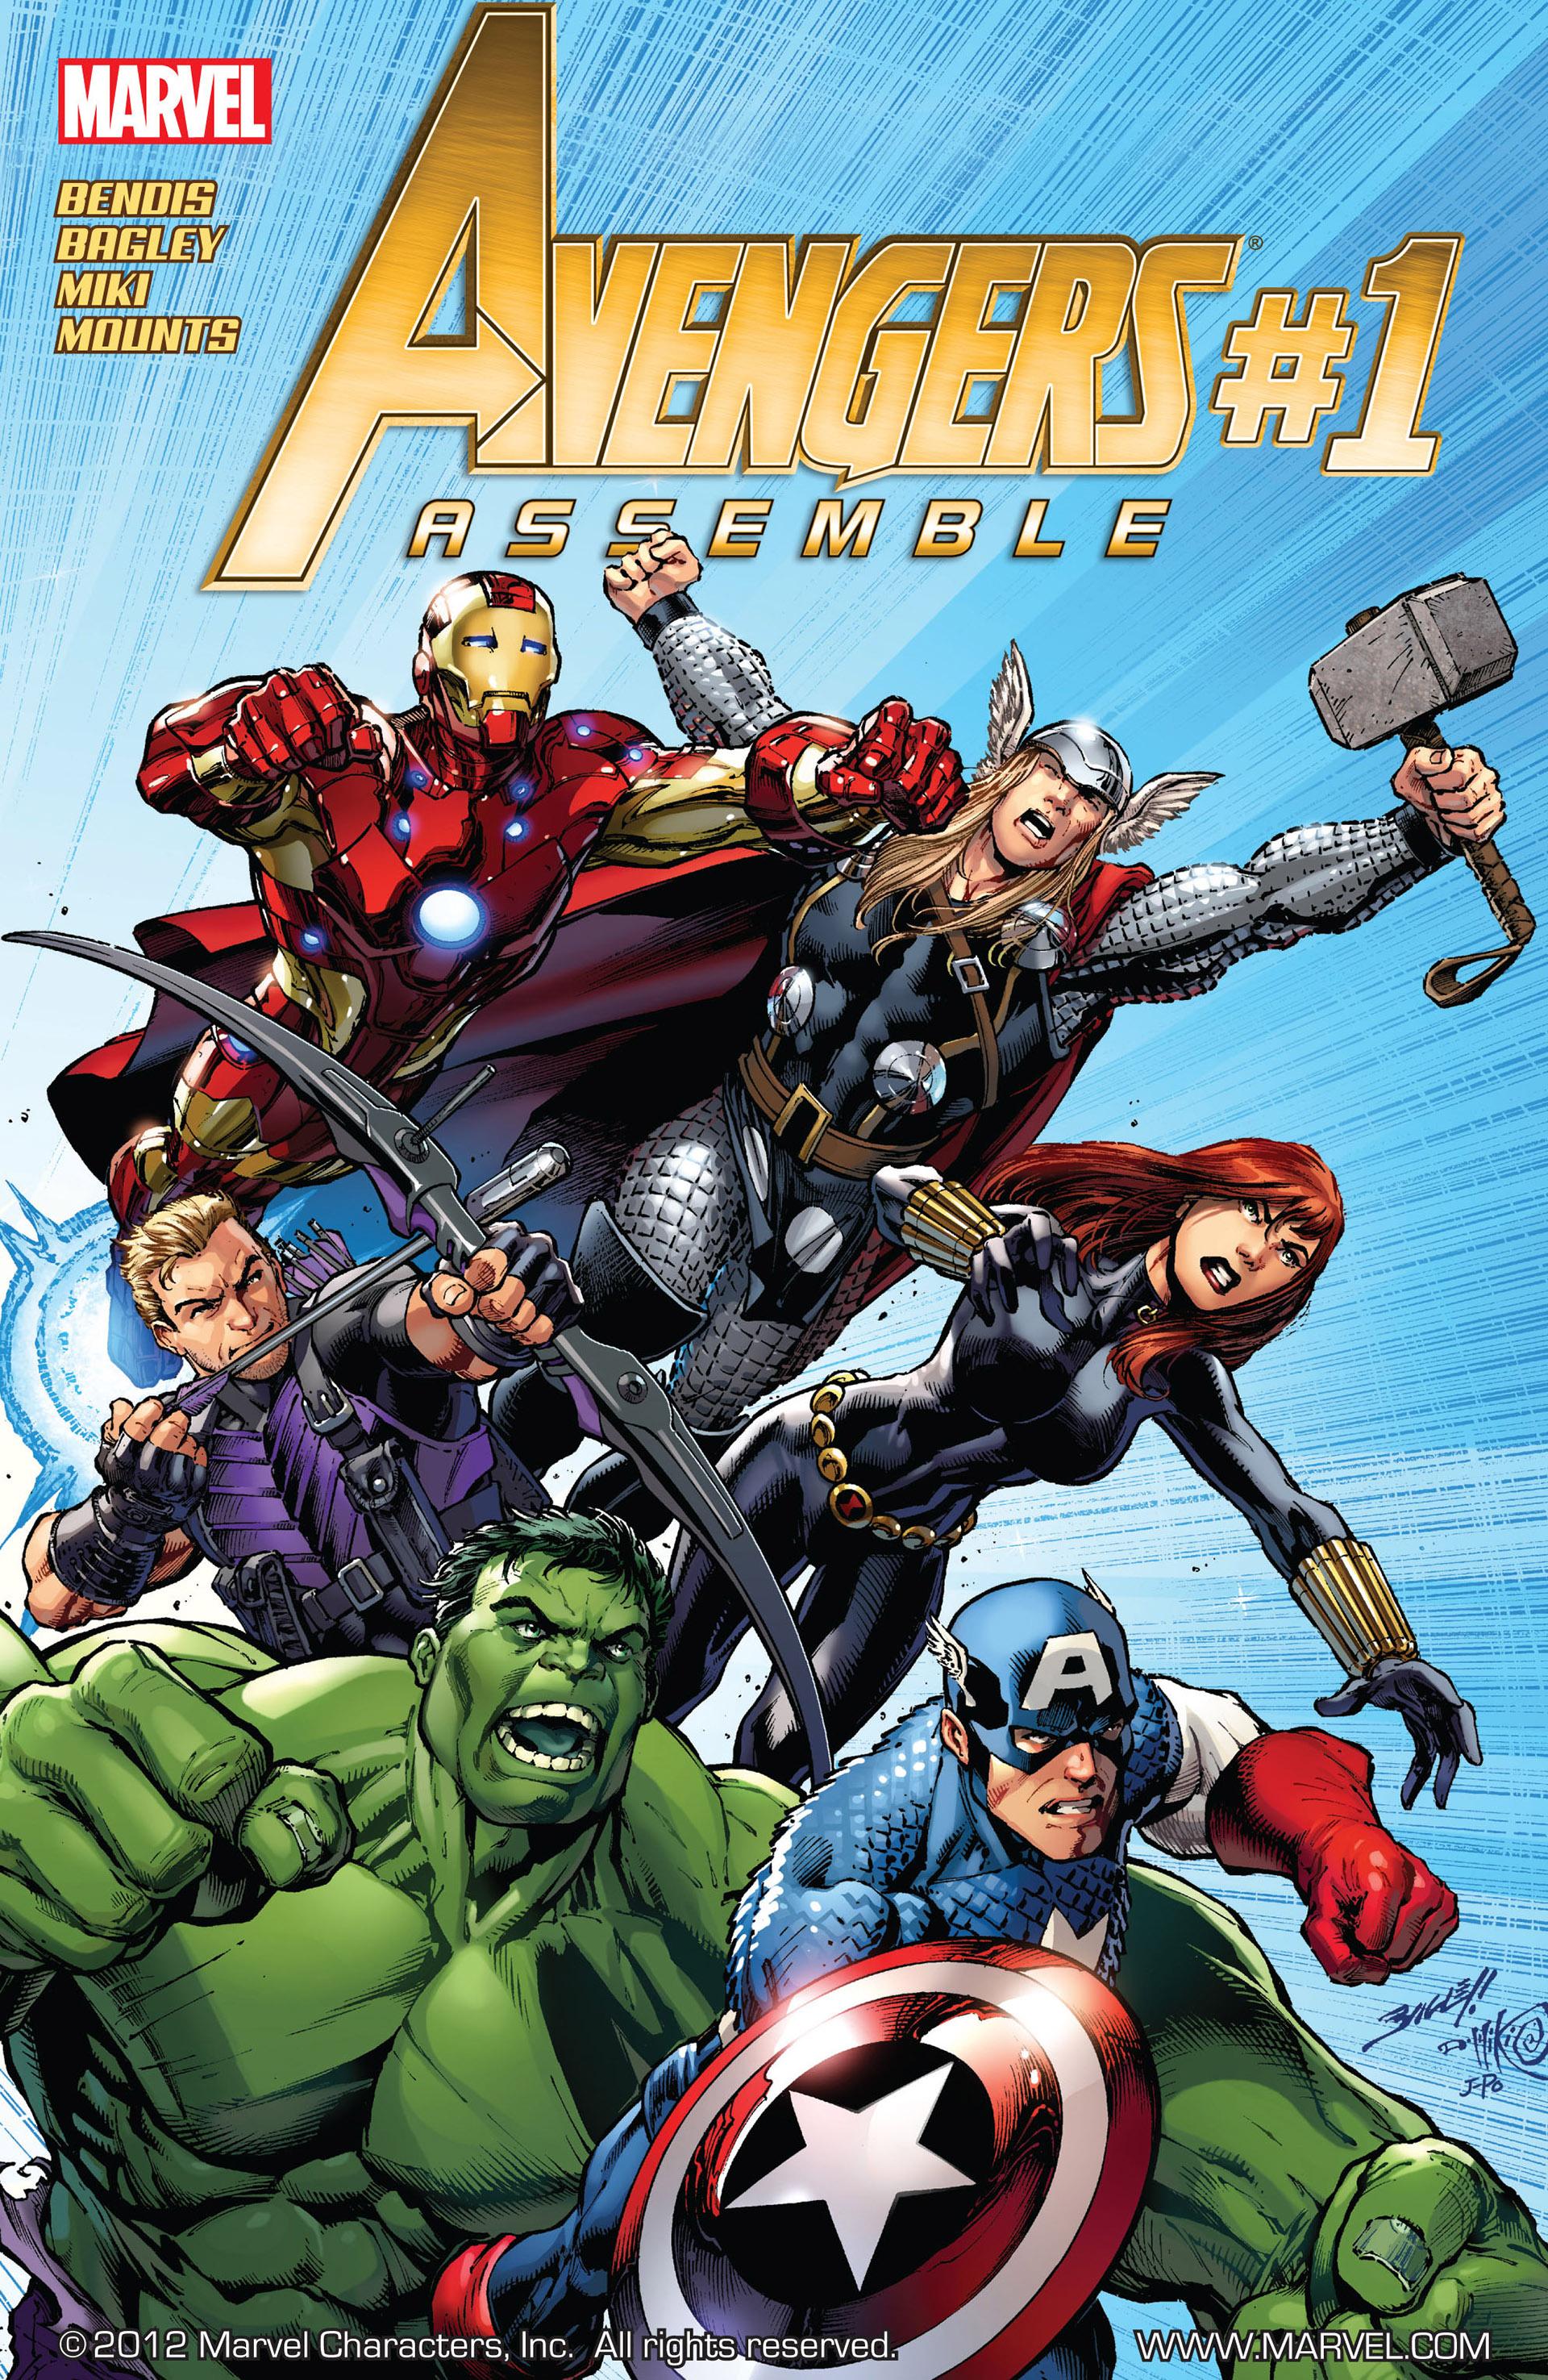 Avengers Assemble (2012) 1 Page 1